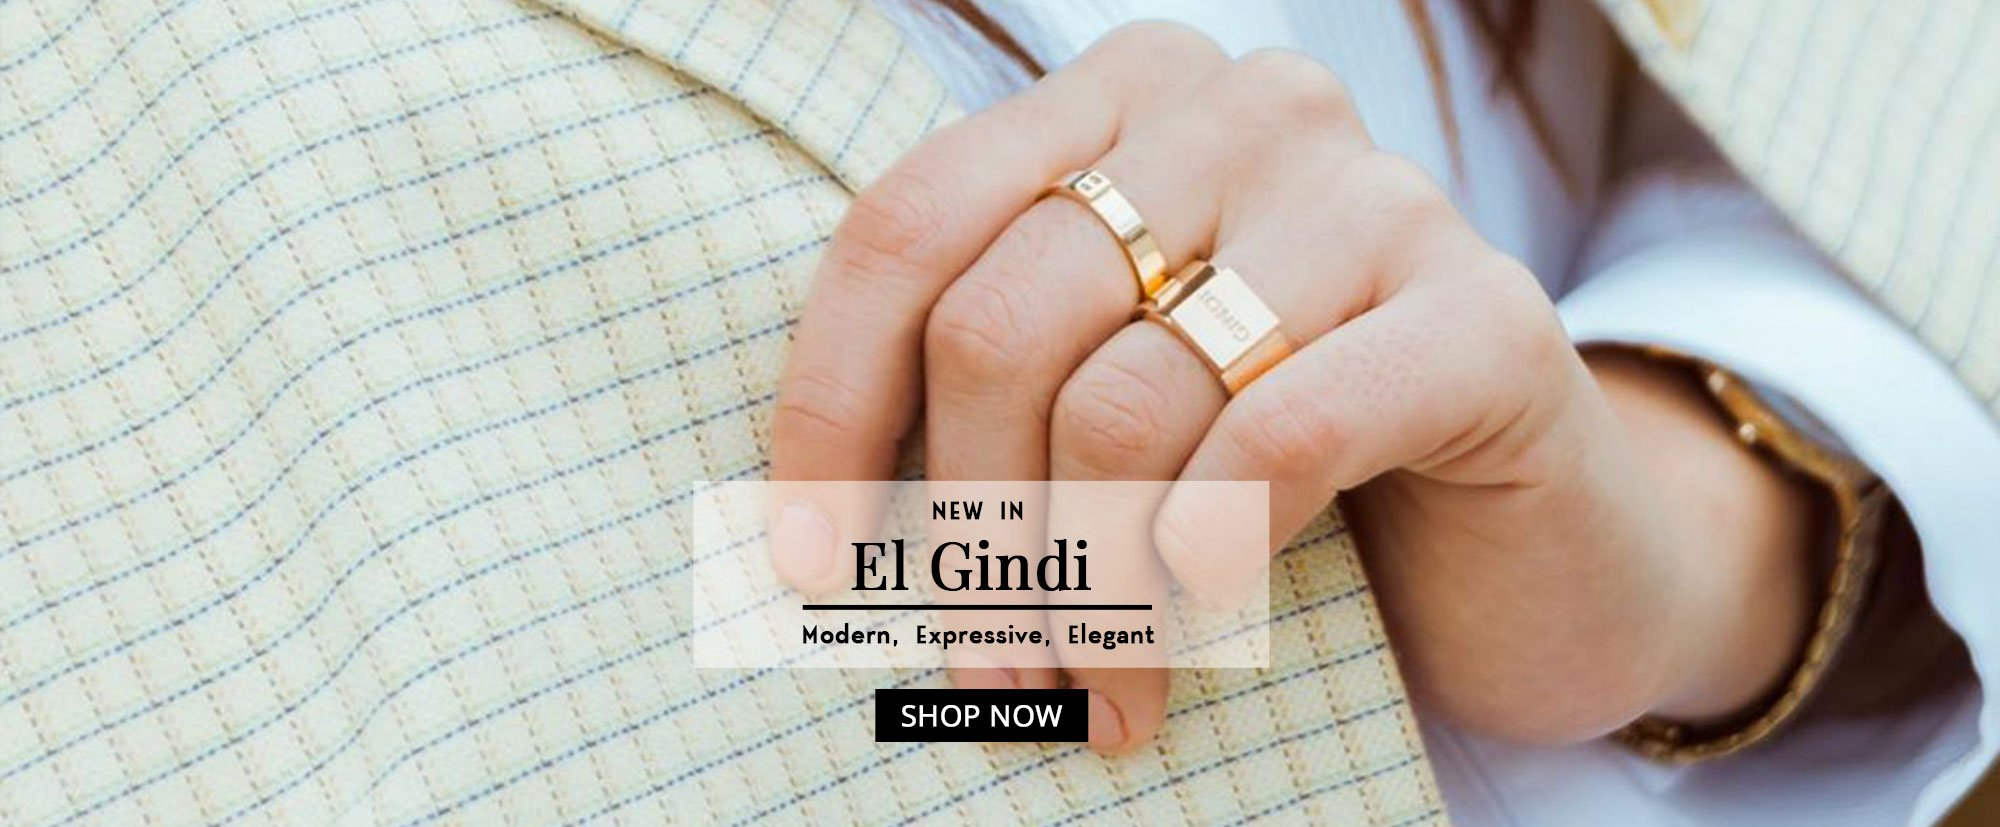 El Gindi